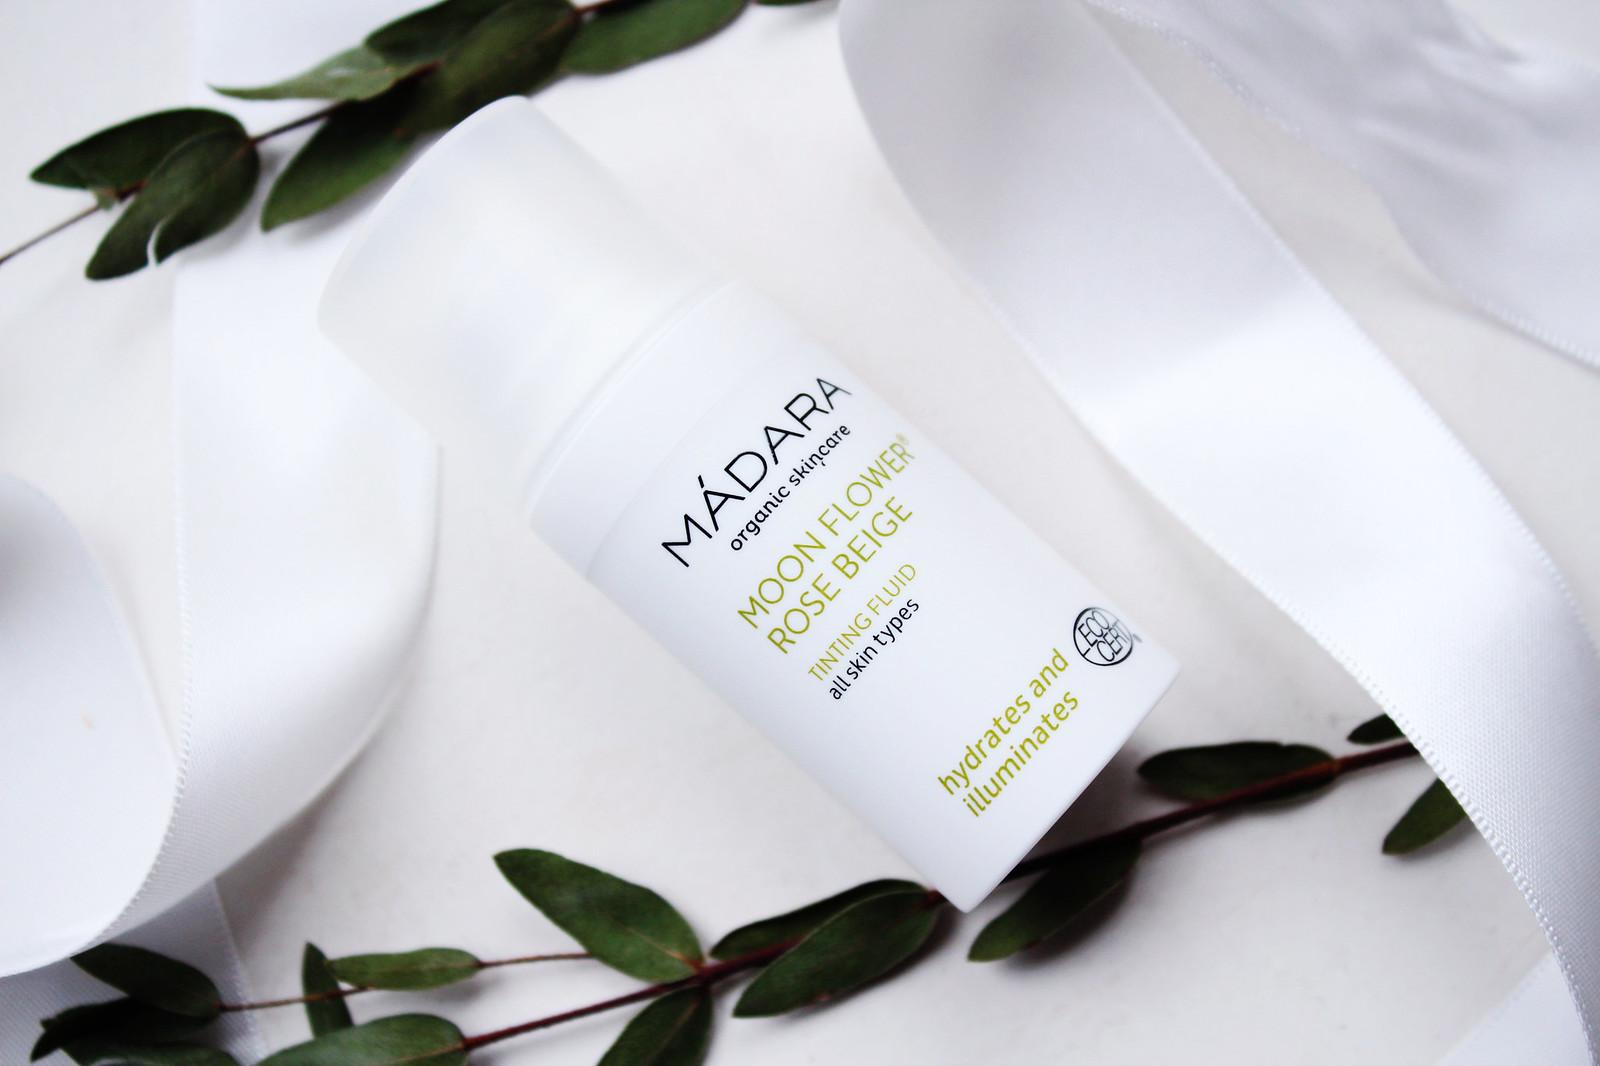 Madara Become Organic atsauksmes